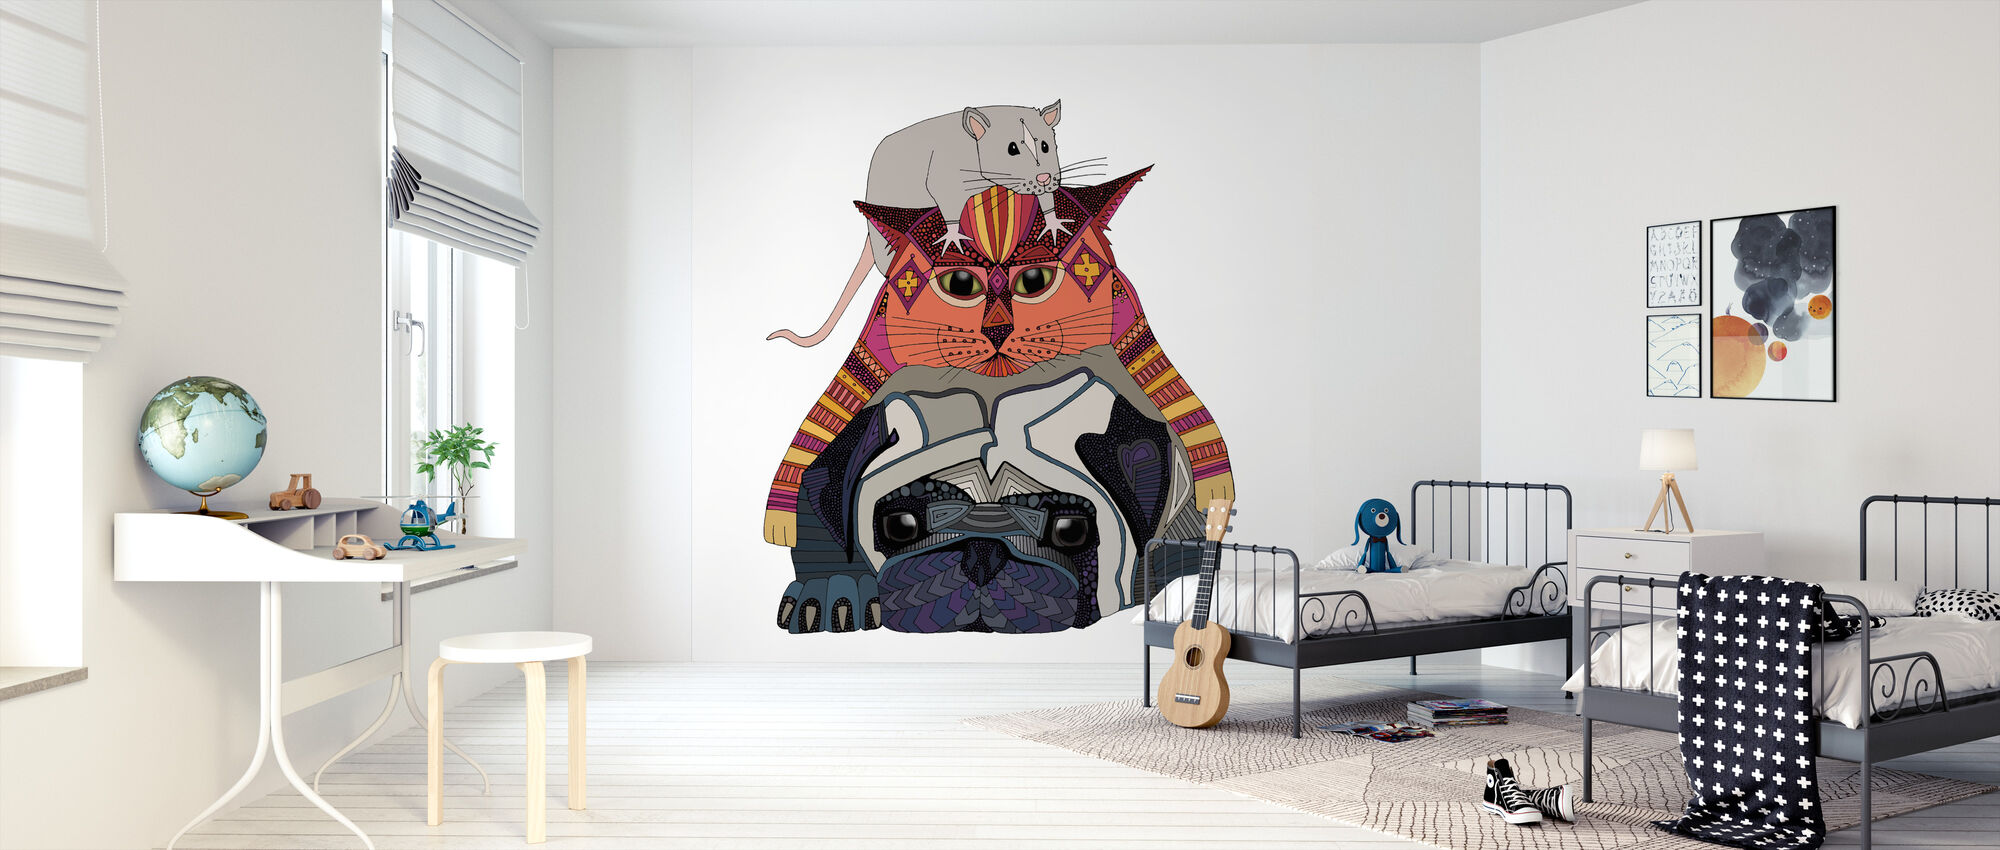 Muis en kat en mopje - Behang - Kinderkamer